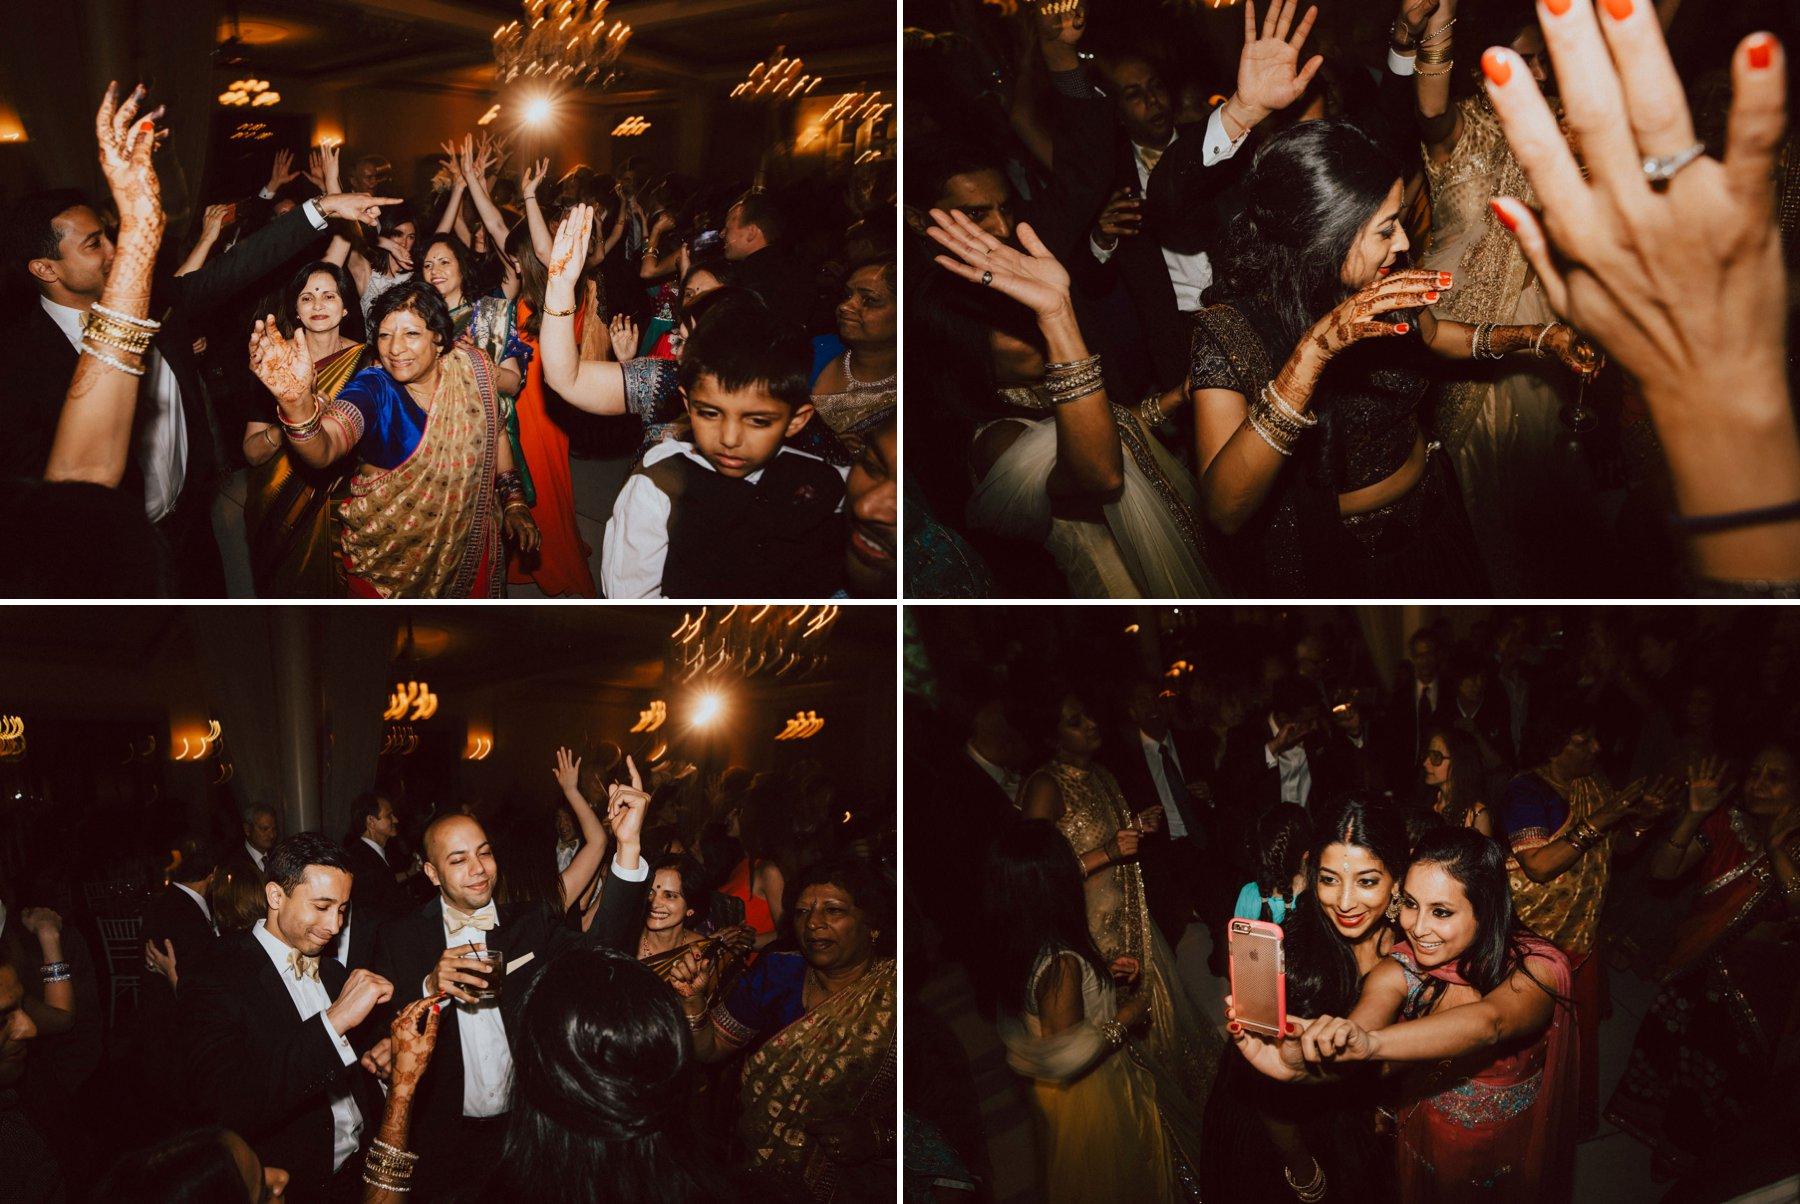 vie-philadelphia-indian-wedding-124.jpg